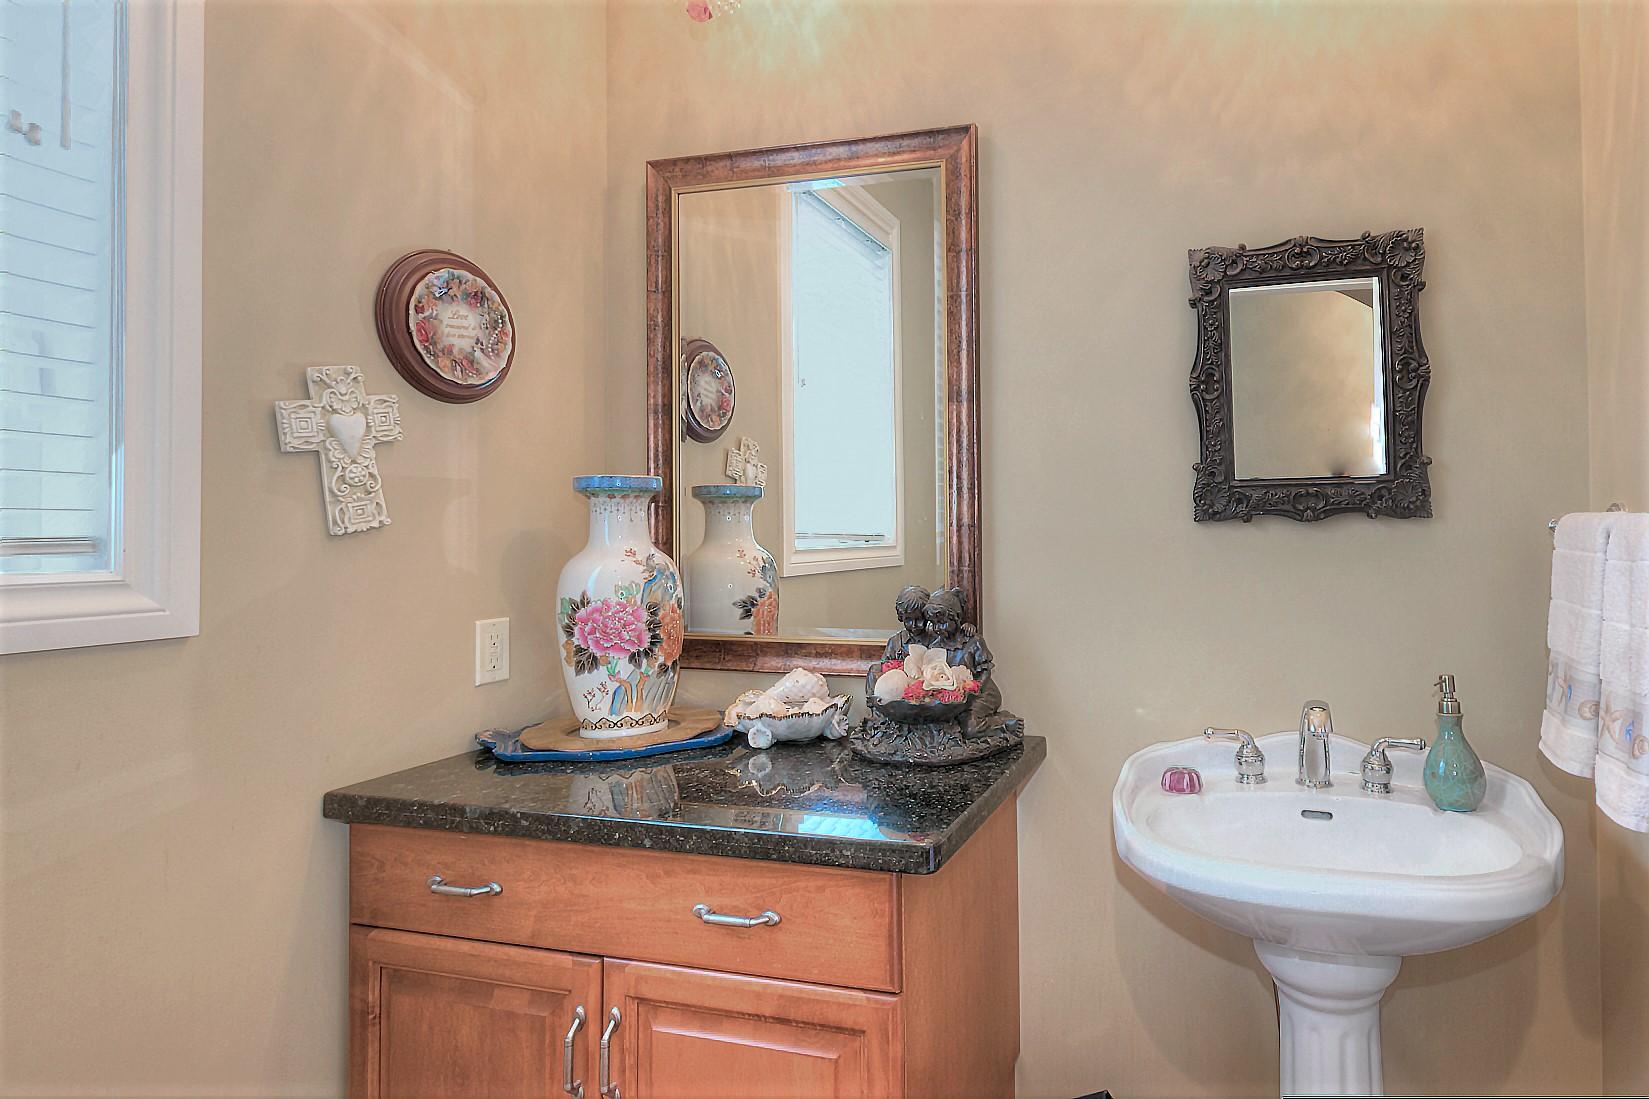 Bathroom Cabinets Kelowna 540 casa grande drive, west kelowna, bc, v1z 3m4 - jane hoffman group